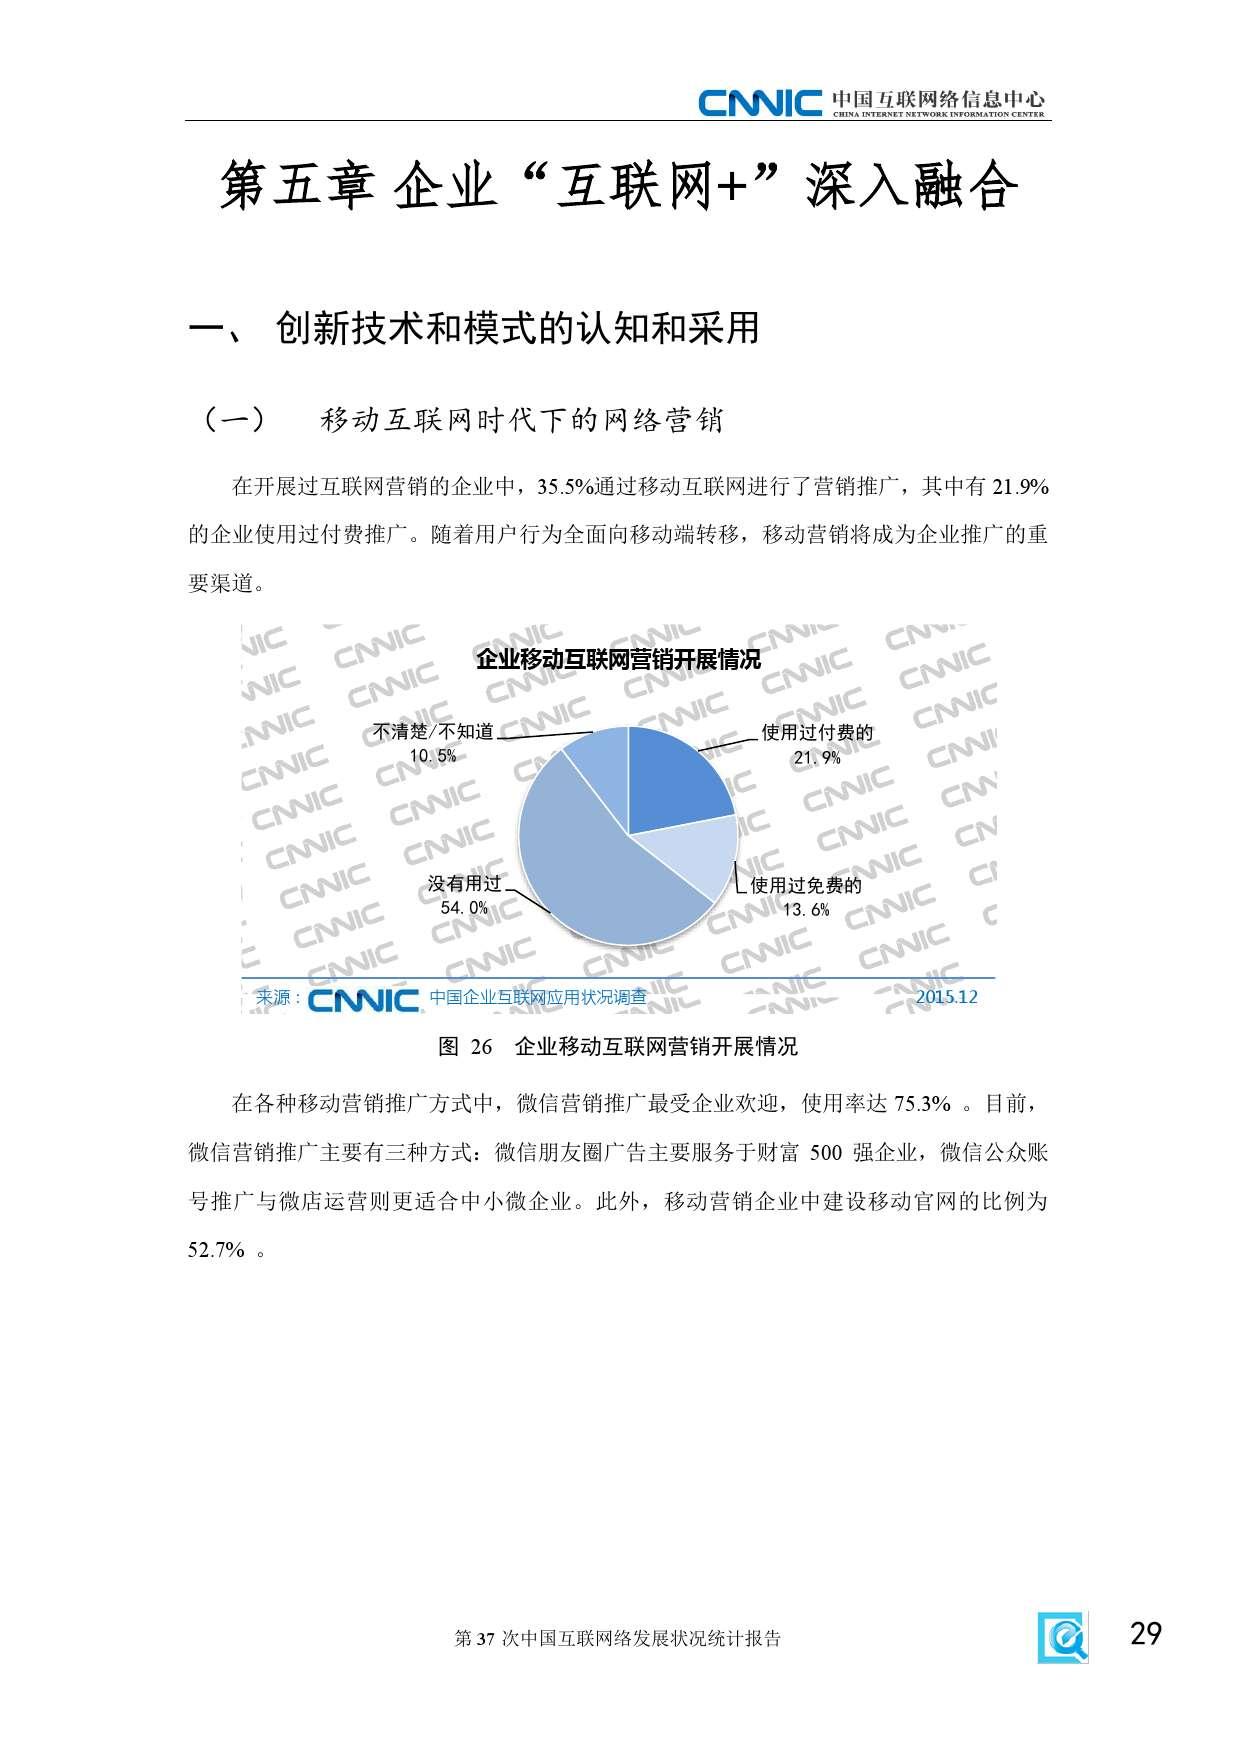 CNNIC:2015年第37次中国互联网络发展状况统计报告_000035